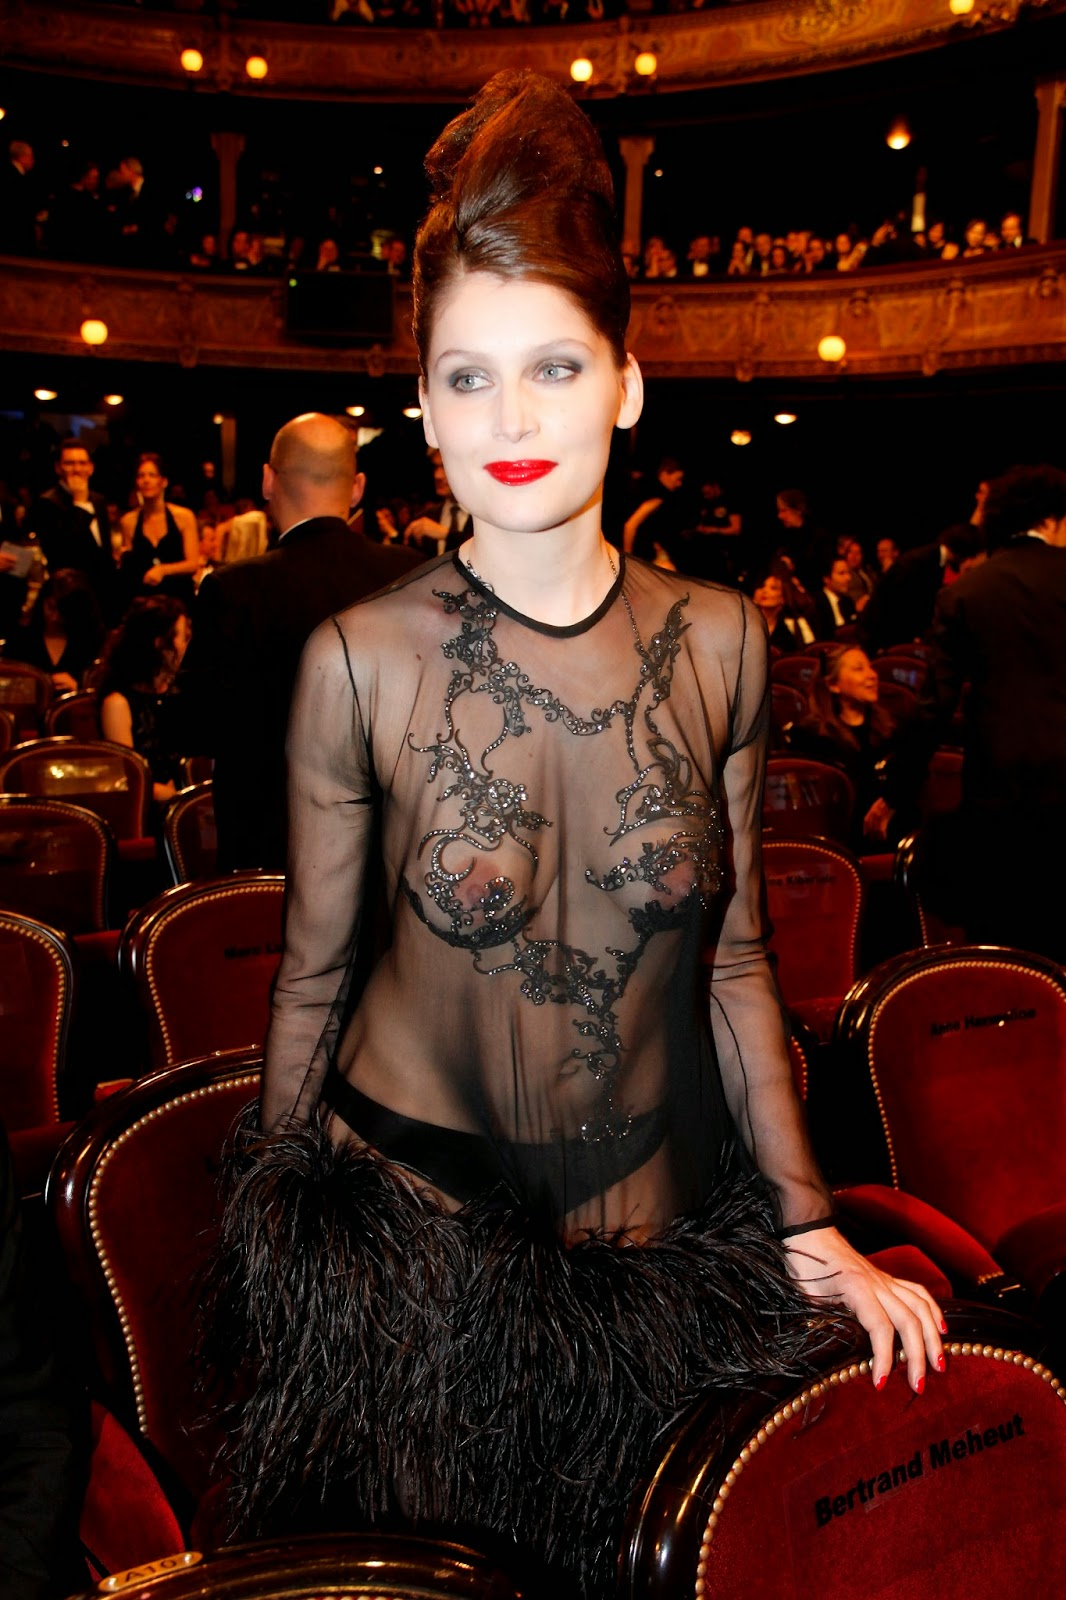 Amy Christine Dumas Nude dragon: fashion / nude look